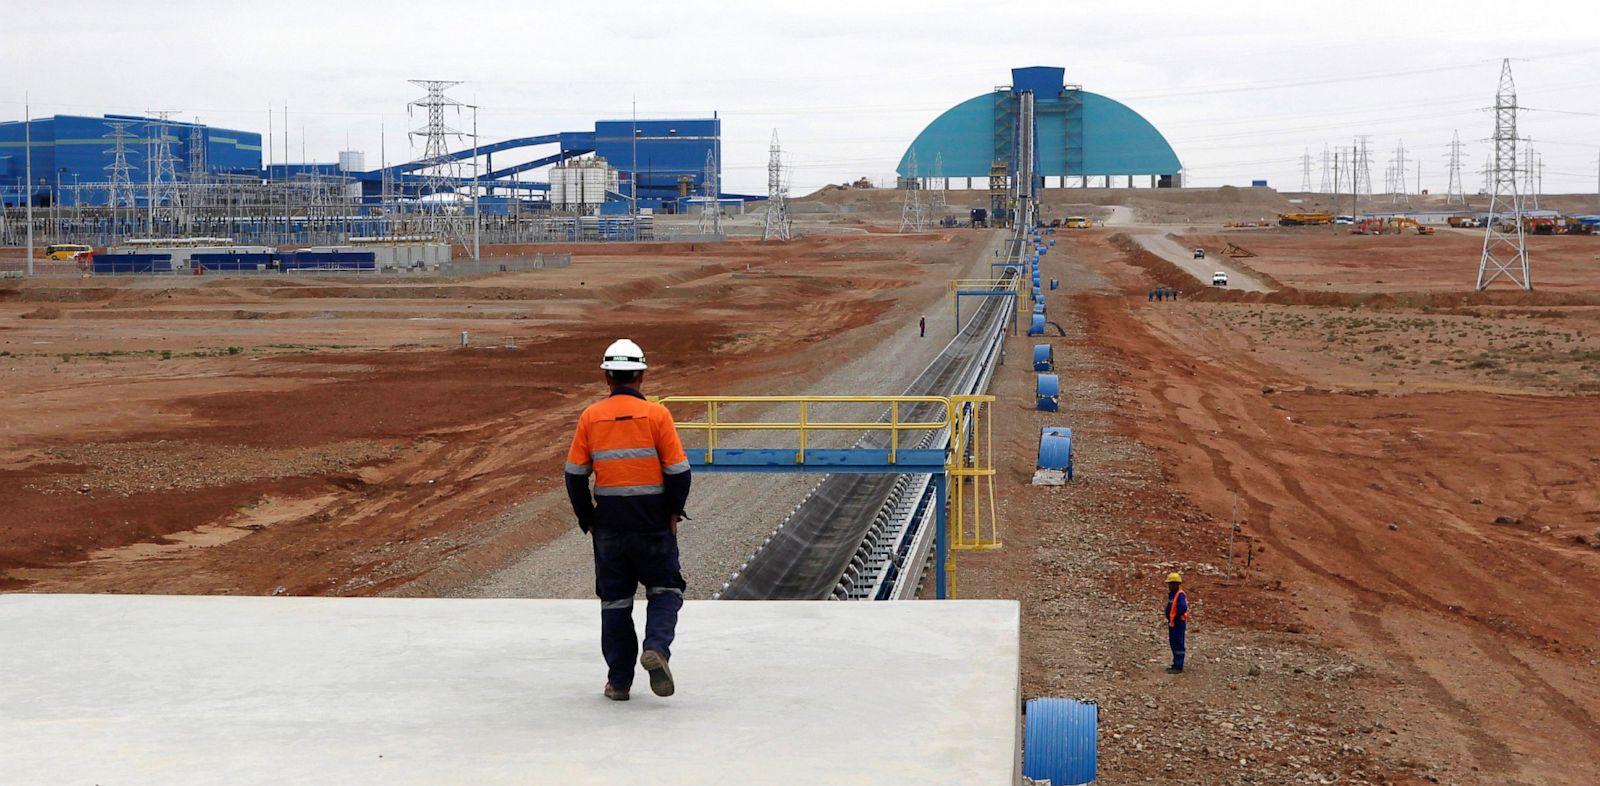 PHOTO: Oyu Tolgoi mine in Mongolias South Gobi region